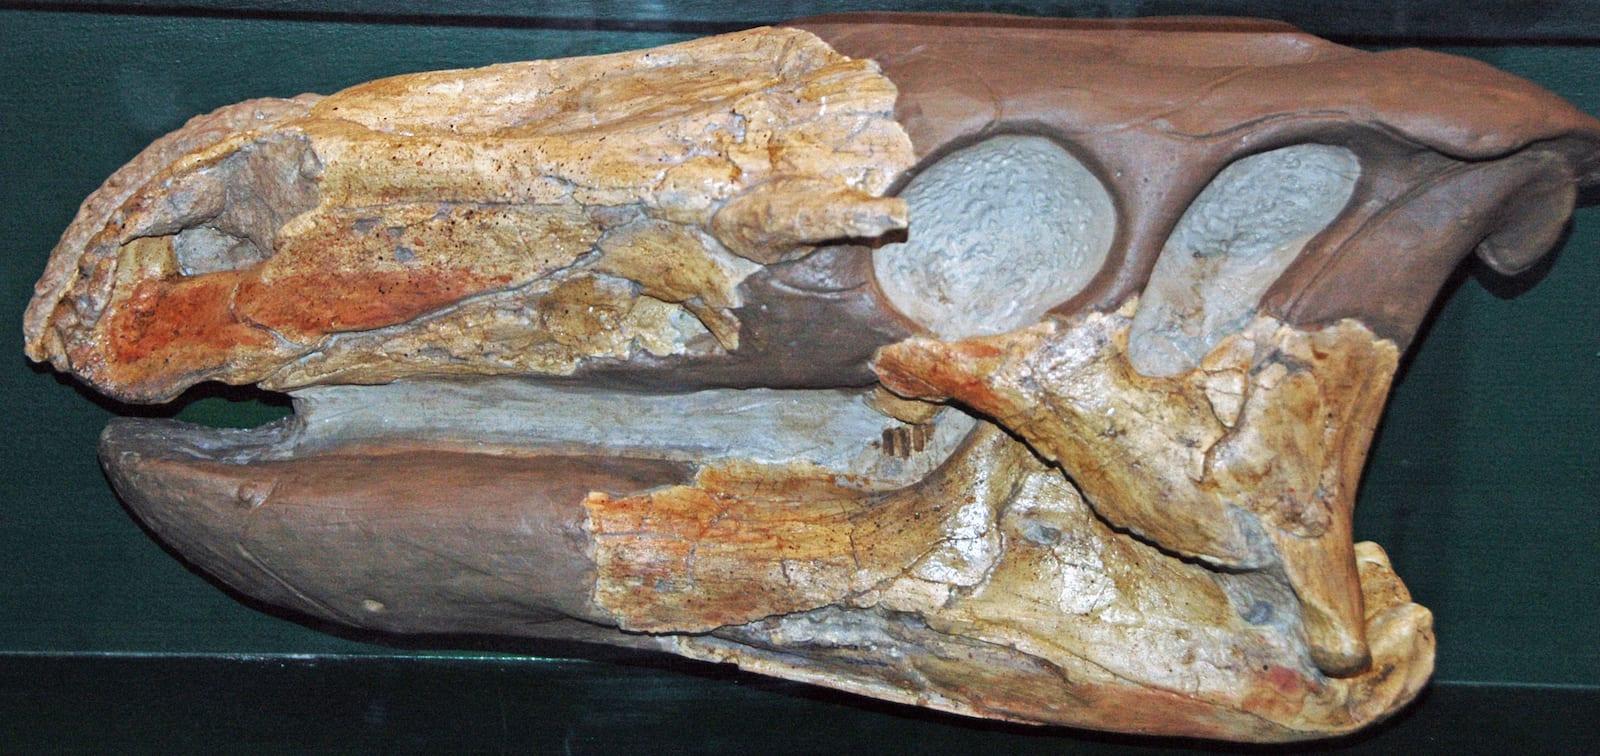 Ornithopod Dinosaur Skull Fossil Garden of the Gods Colorado Springs